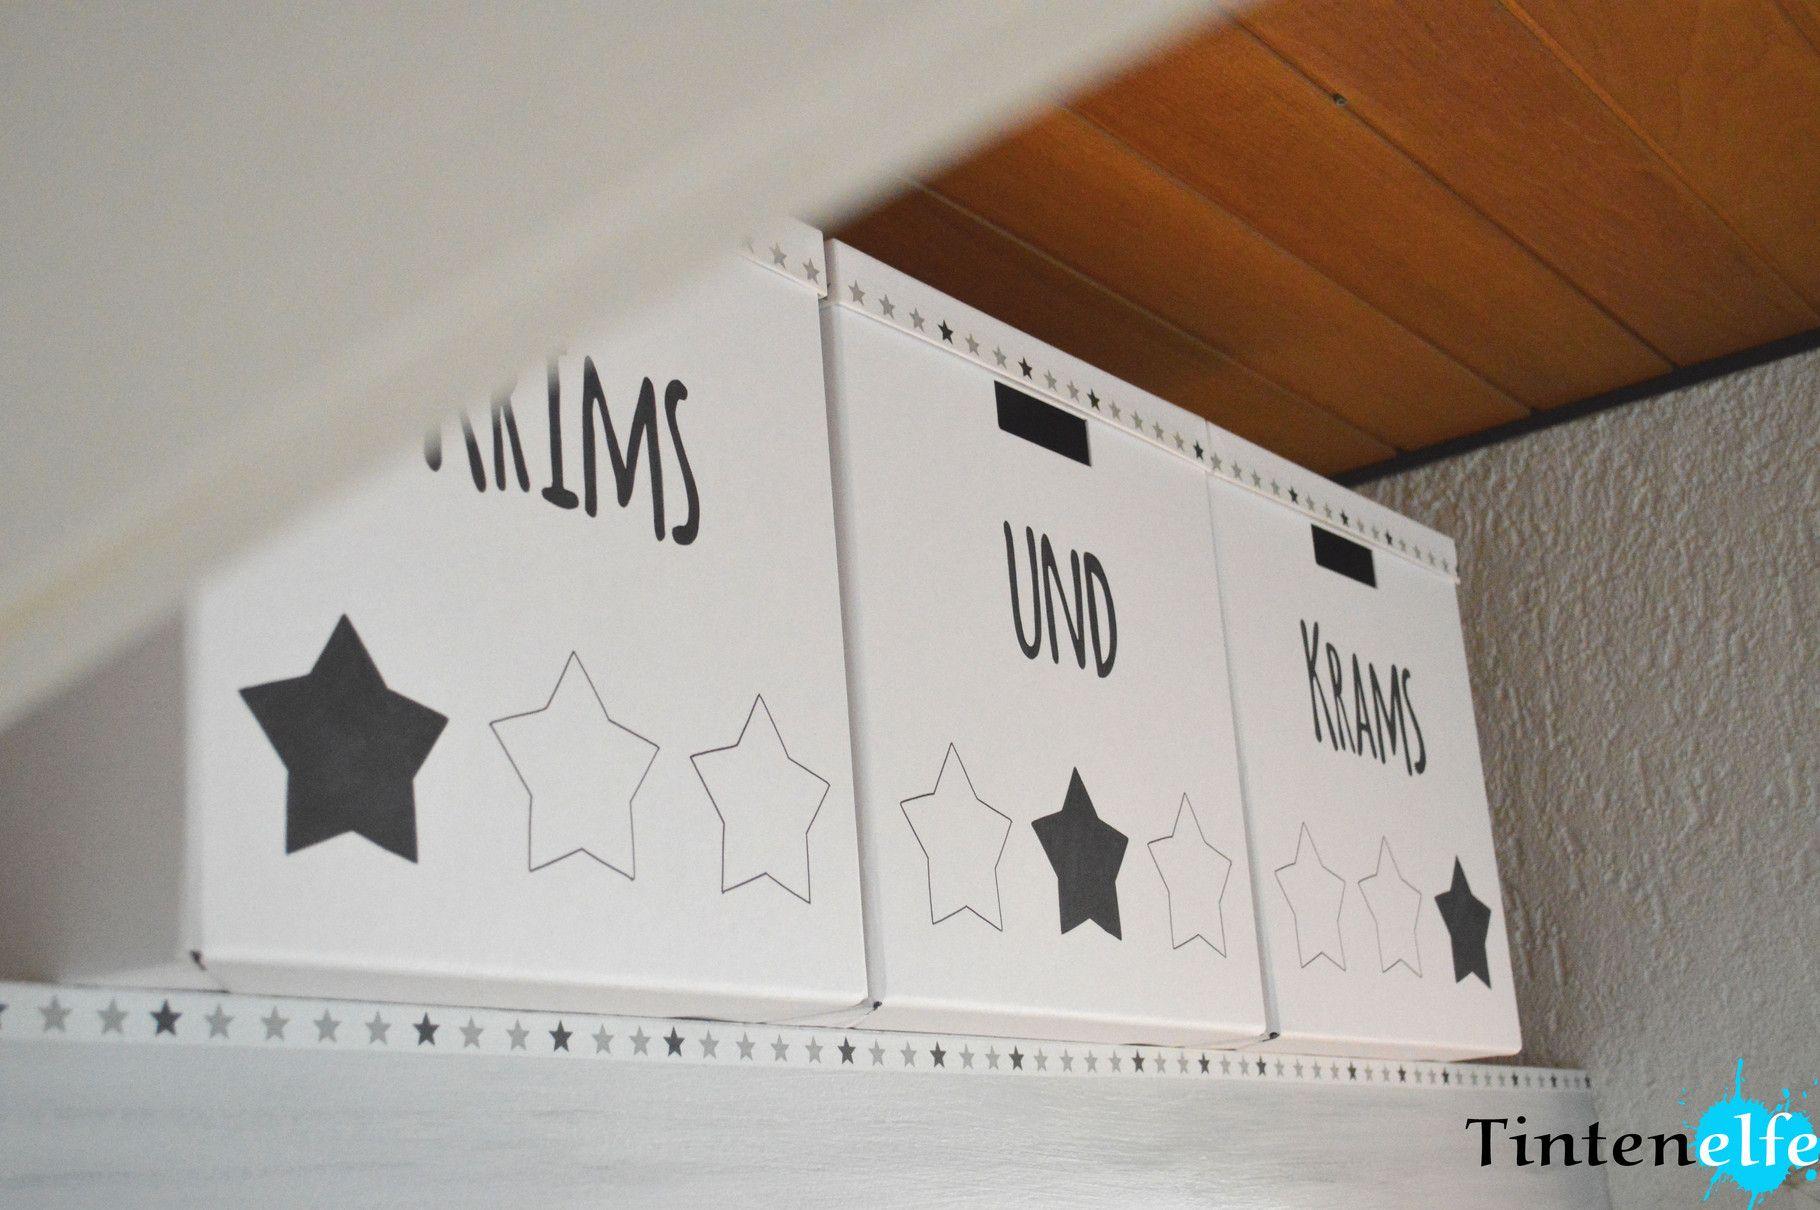 Blog Tintenelfe.de   Ikea Kiste Tjena Aufhübschen #ikea #ikeahack #tjena #  · Trautes HeimIkea